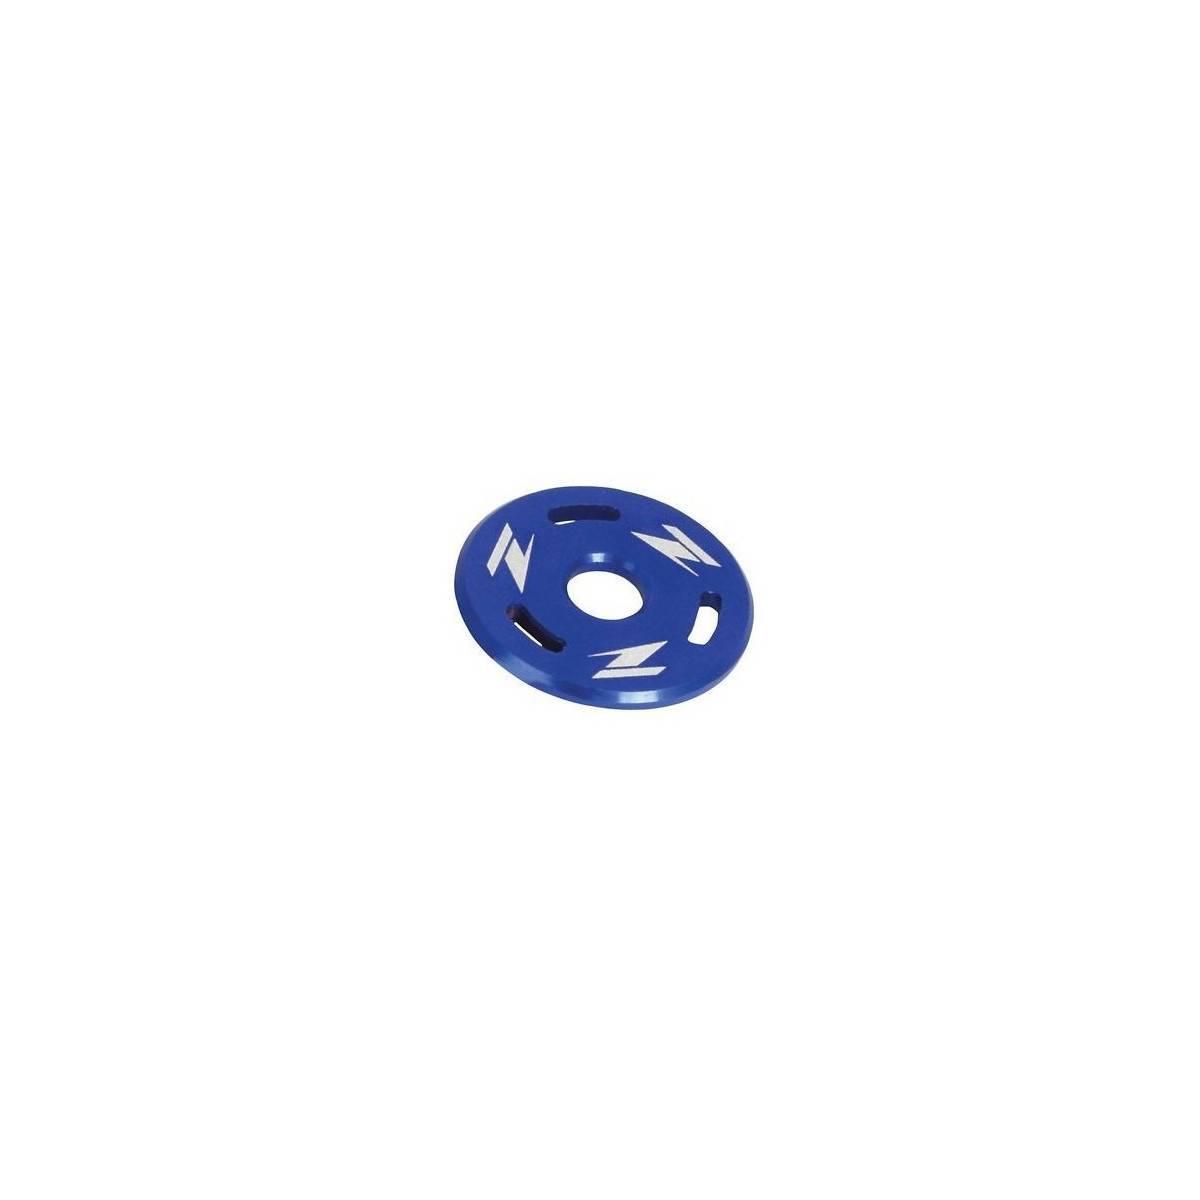 ZE88.0004 - Tuerca Deposito Honda Cr Crf,Yz250F´10 Azul